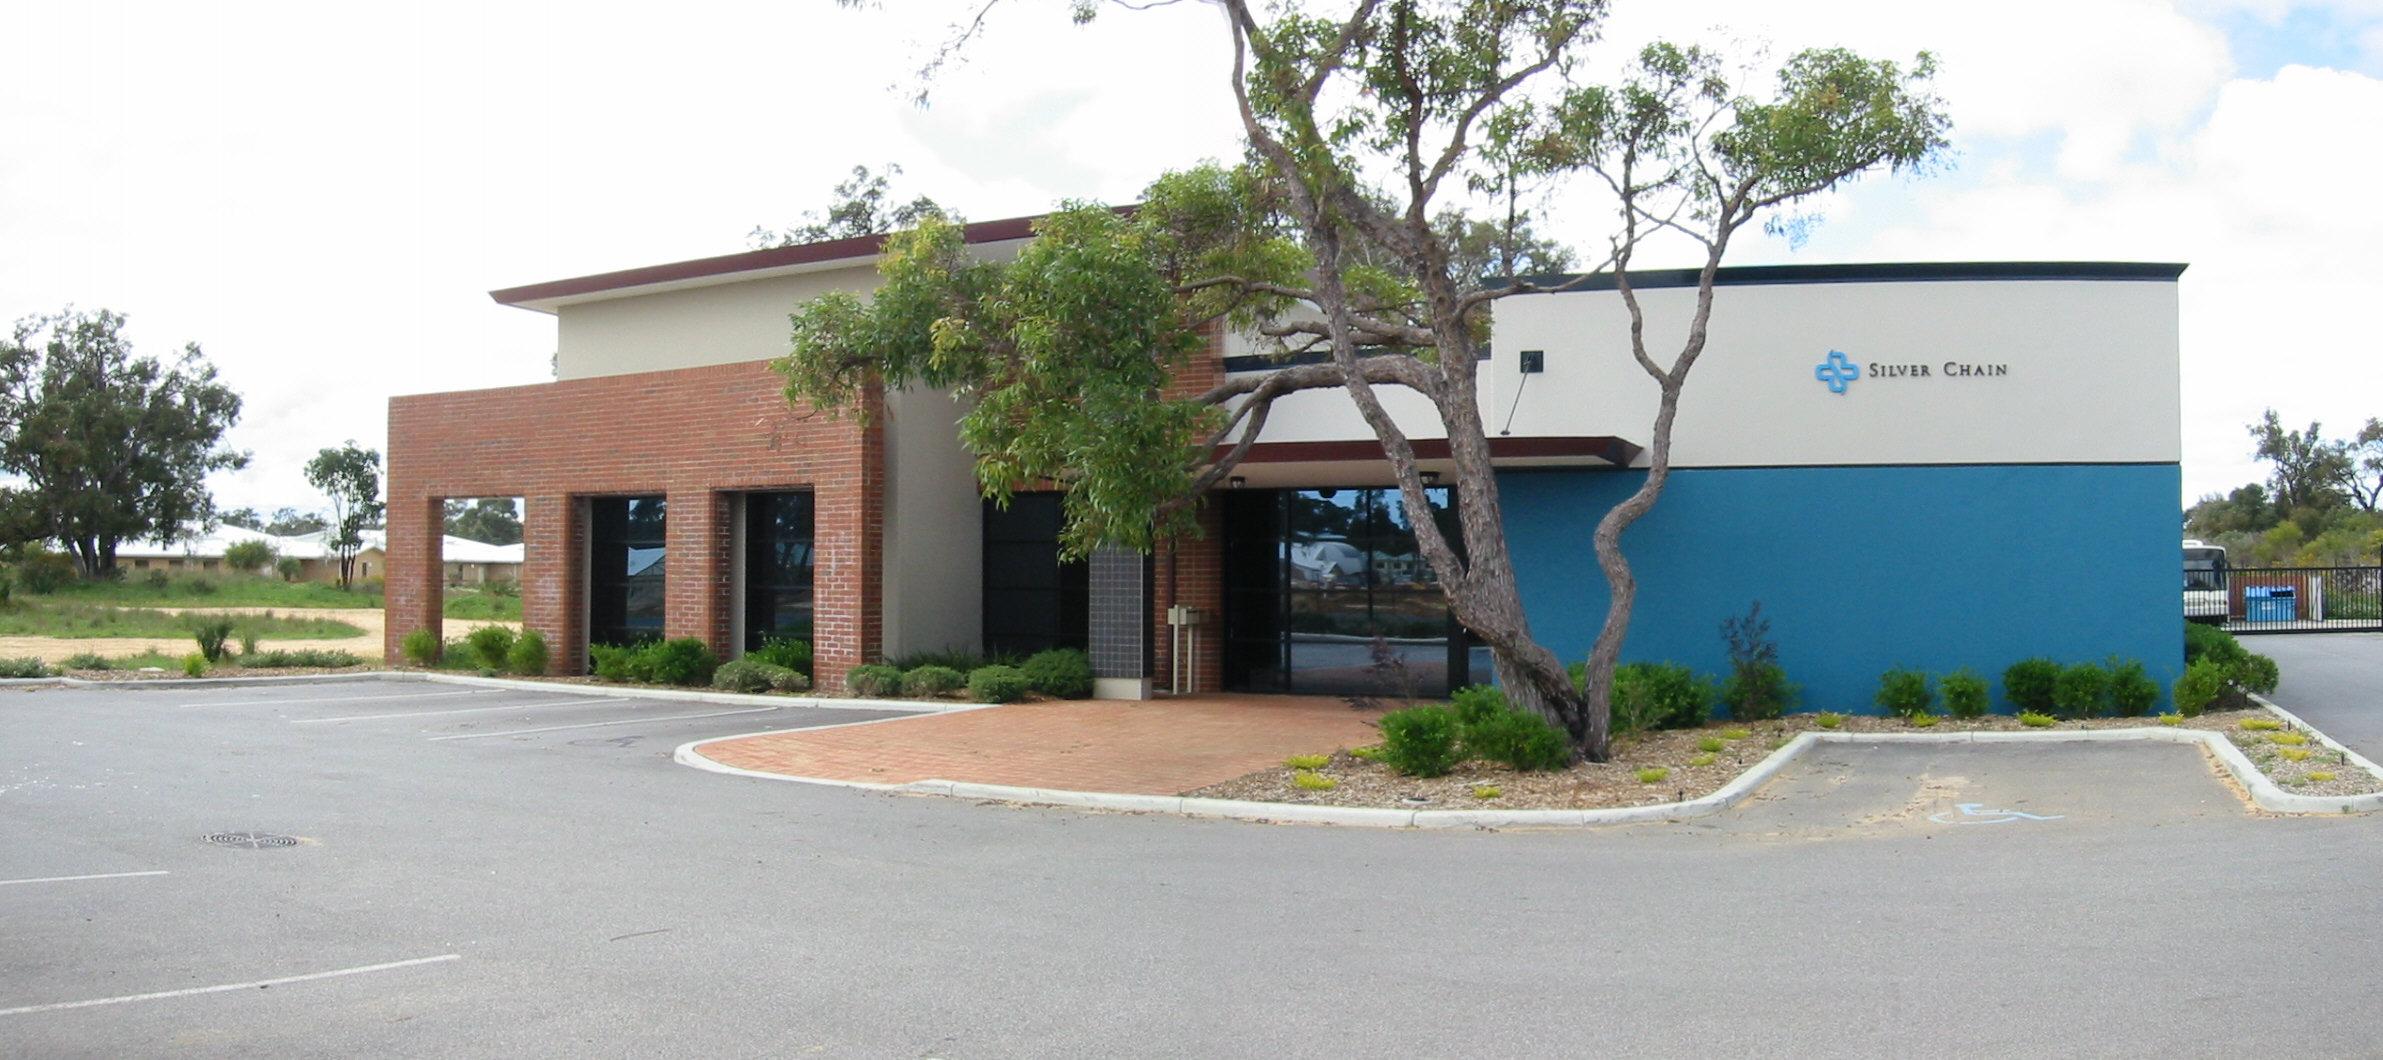 Silver Chain Regional Facility